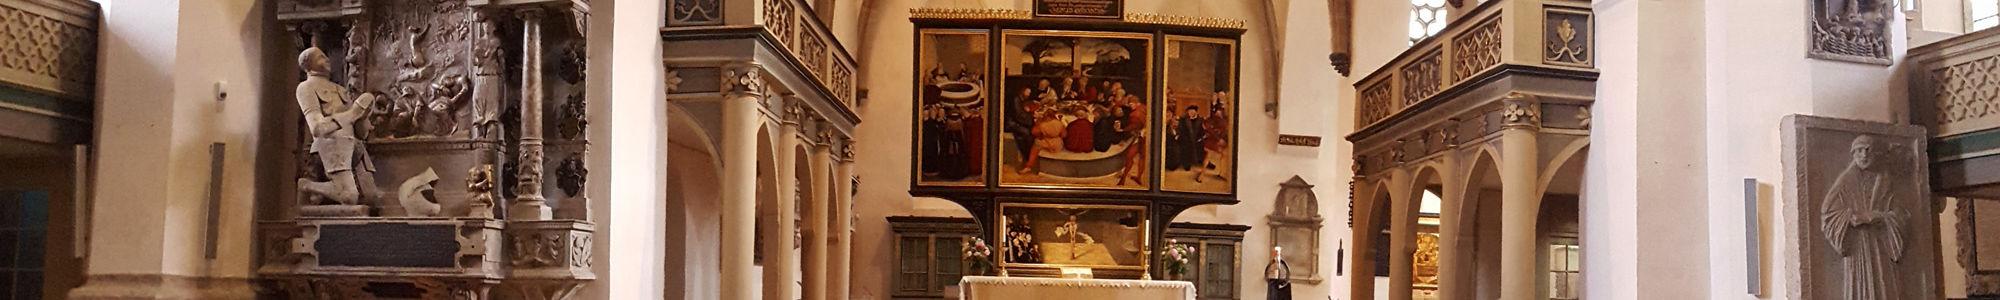 Altar Stadtkirche Wittenberg